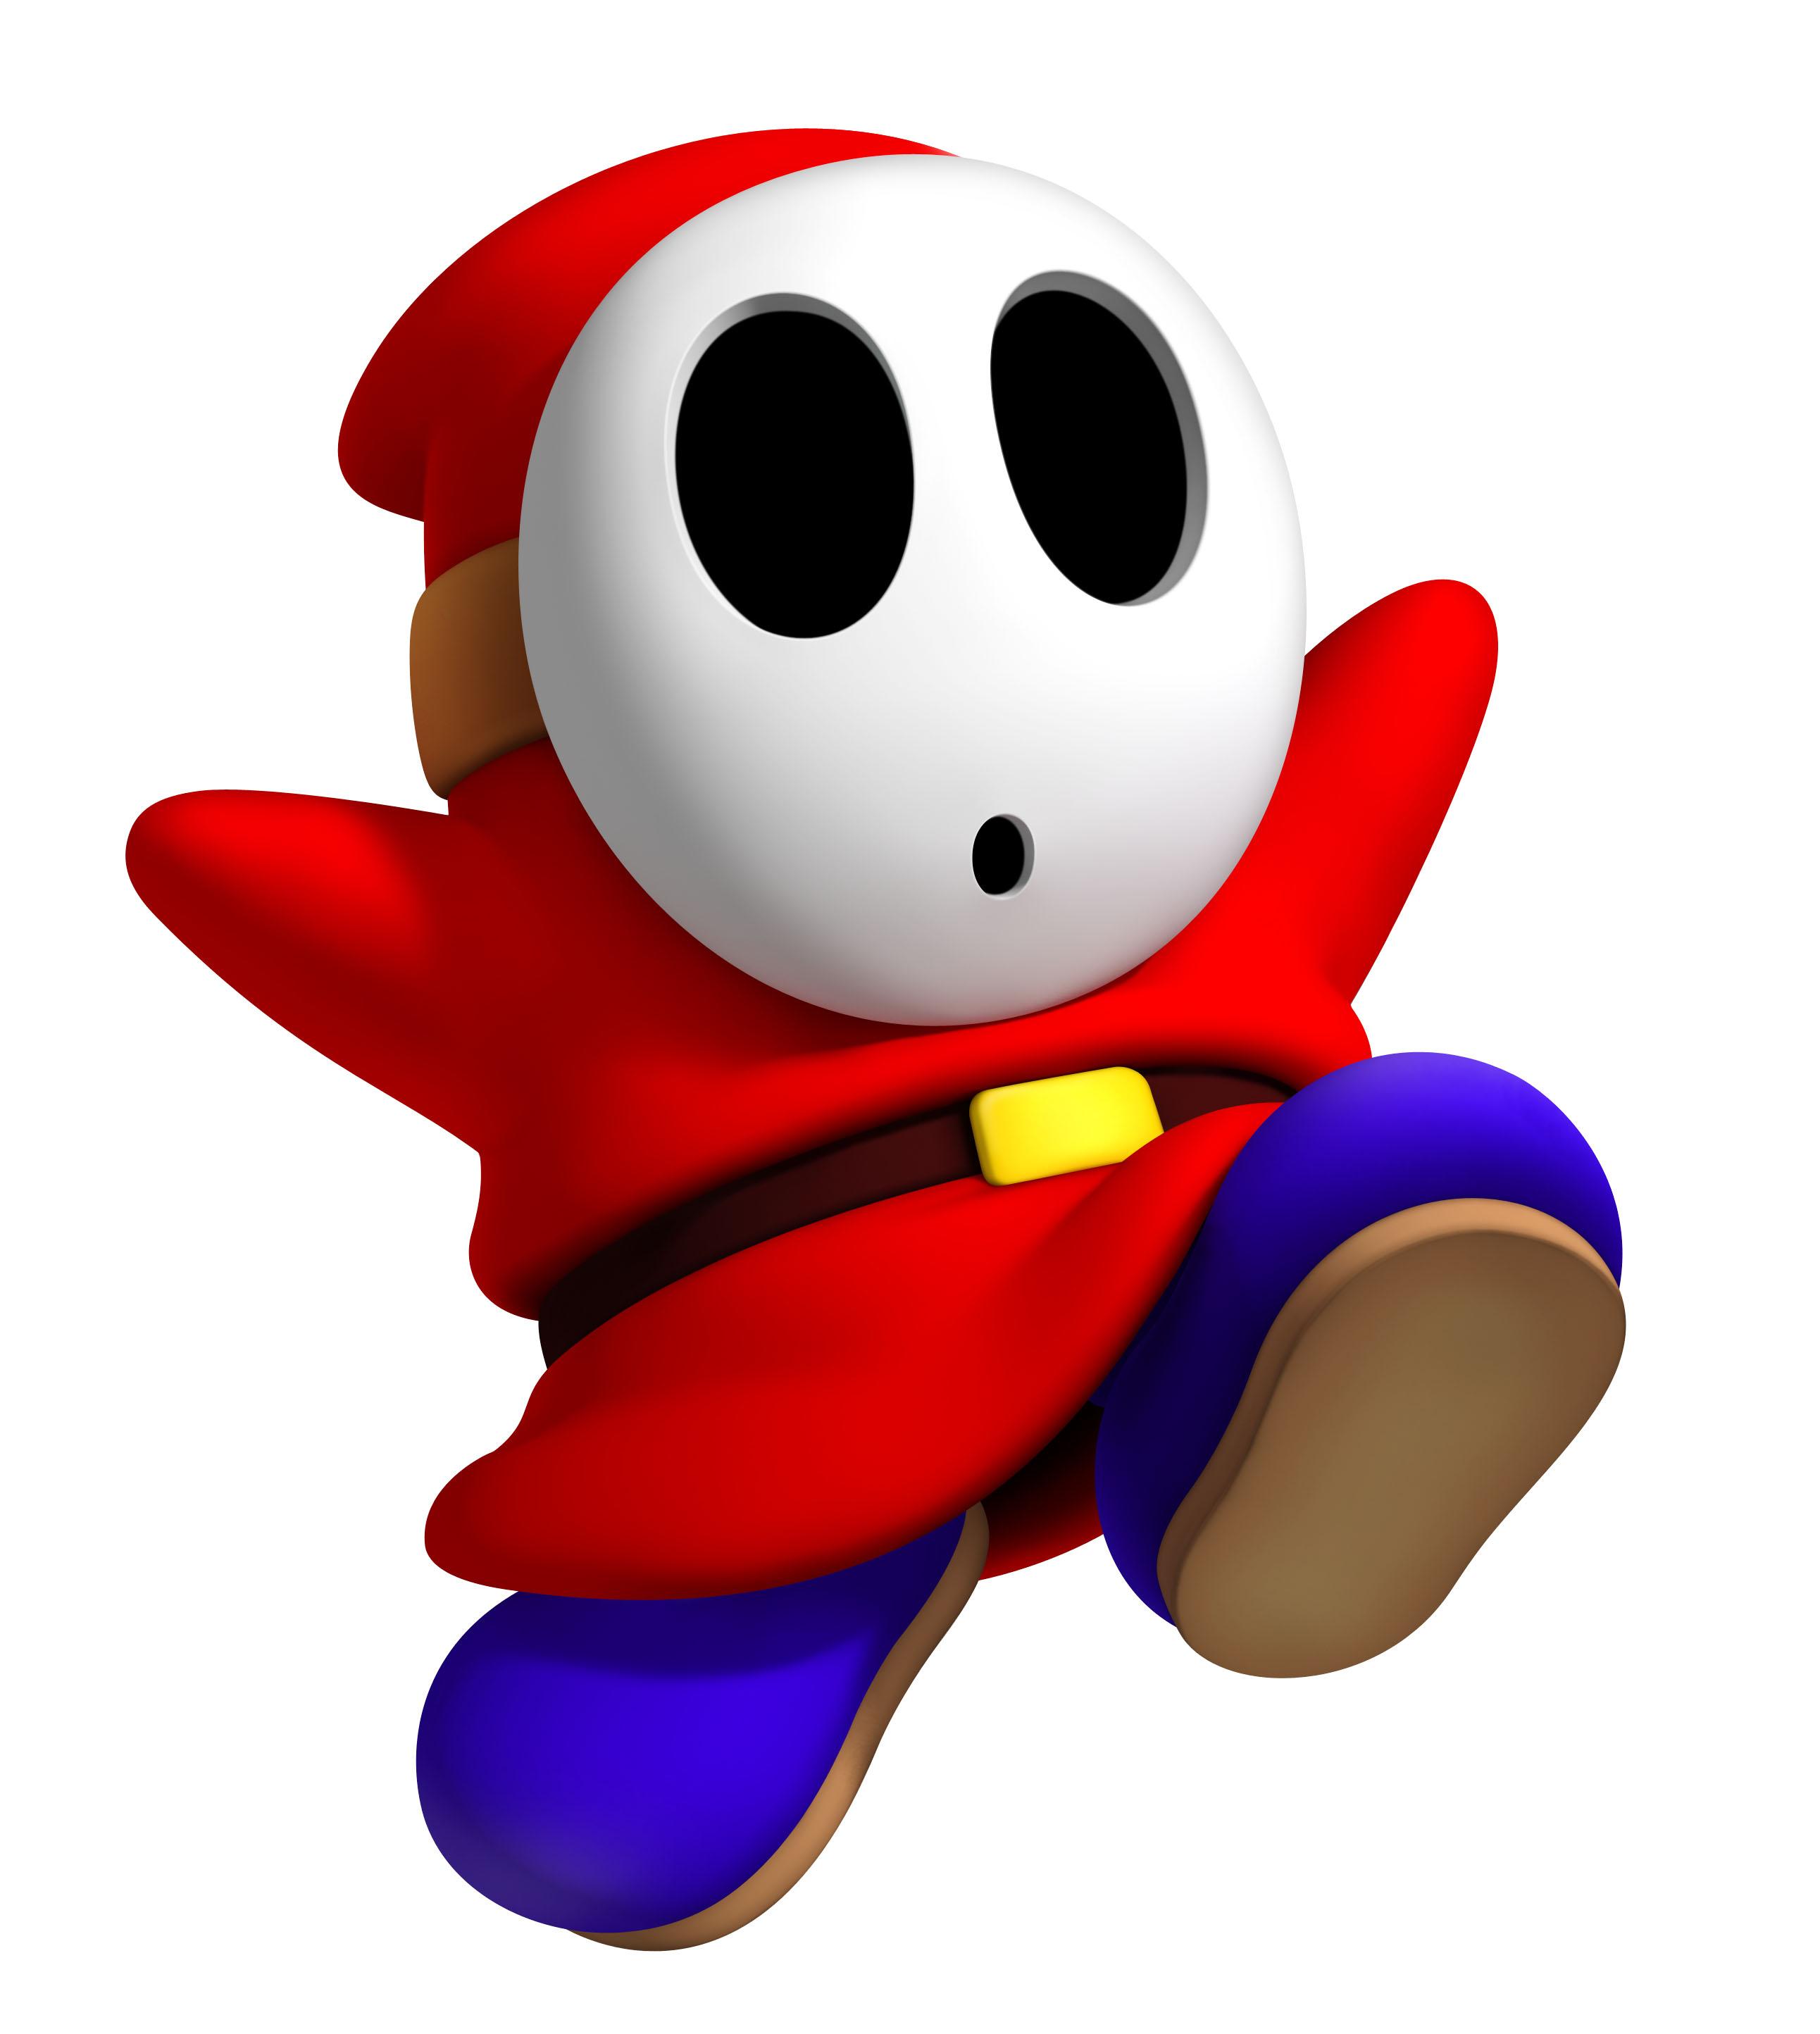 New Mario Party 9 Official Art - Mario Party Legacy